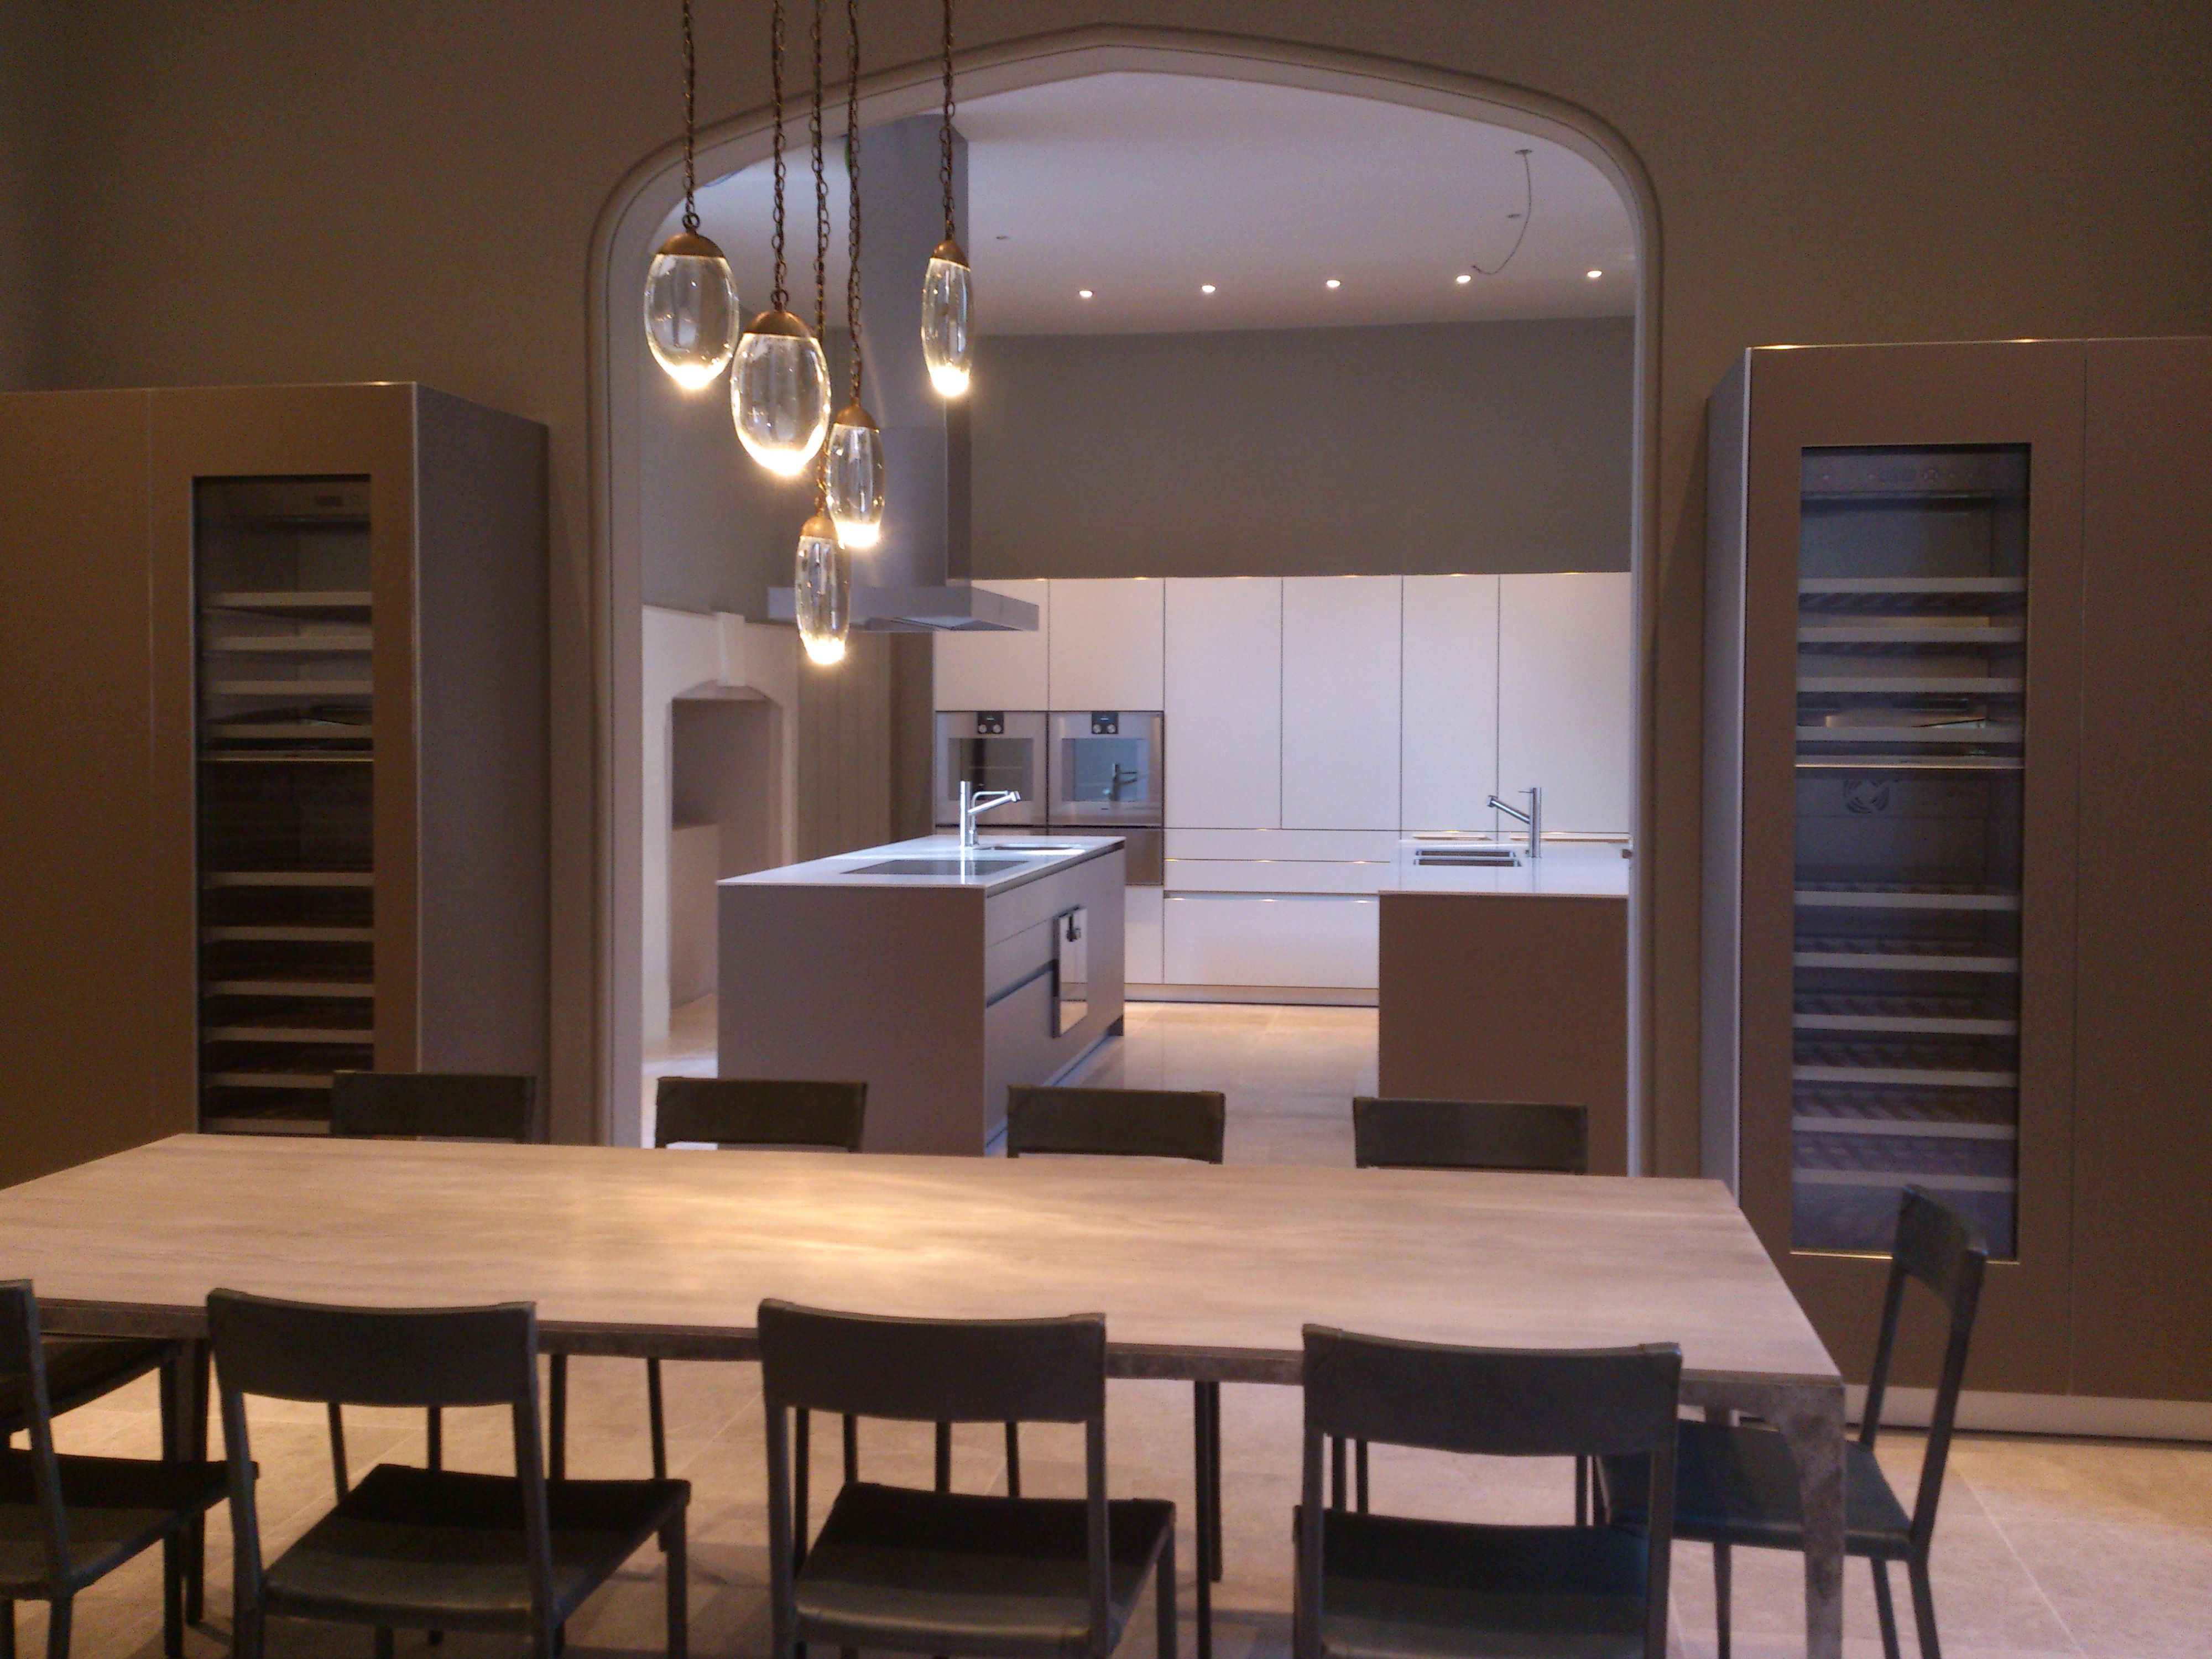 Kitchen Bulthaup - Gaggenau, design by Rocio E.Lereah   House ...